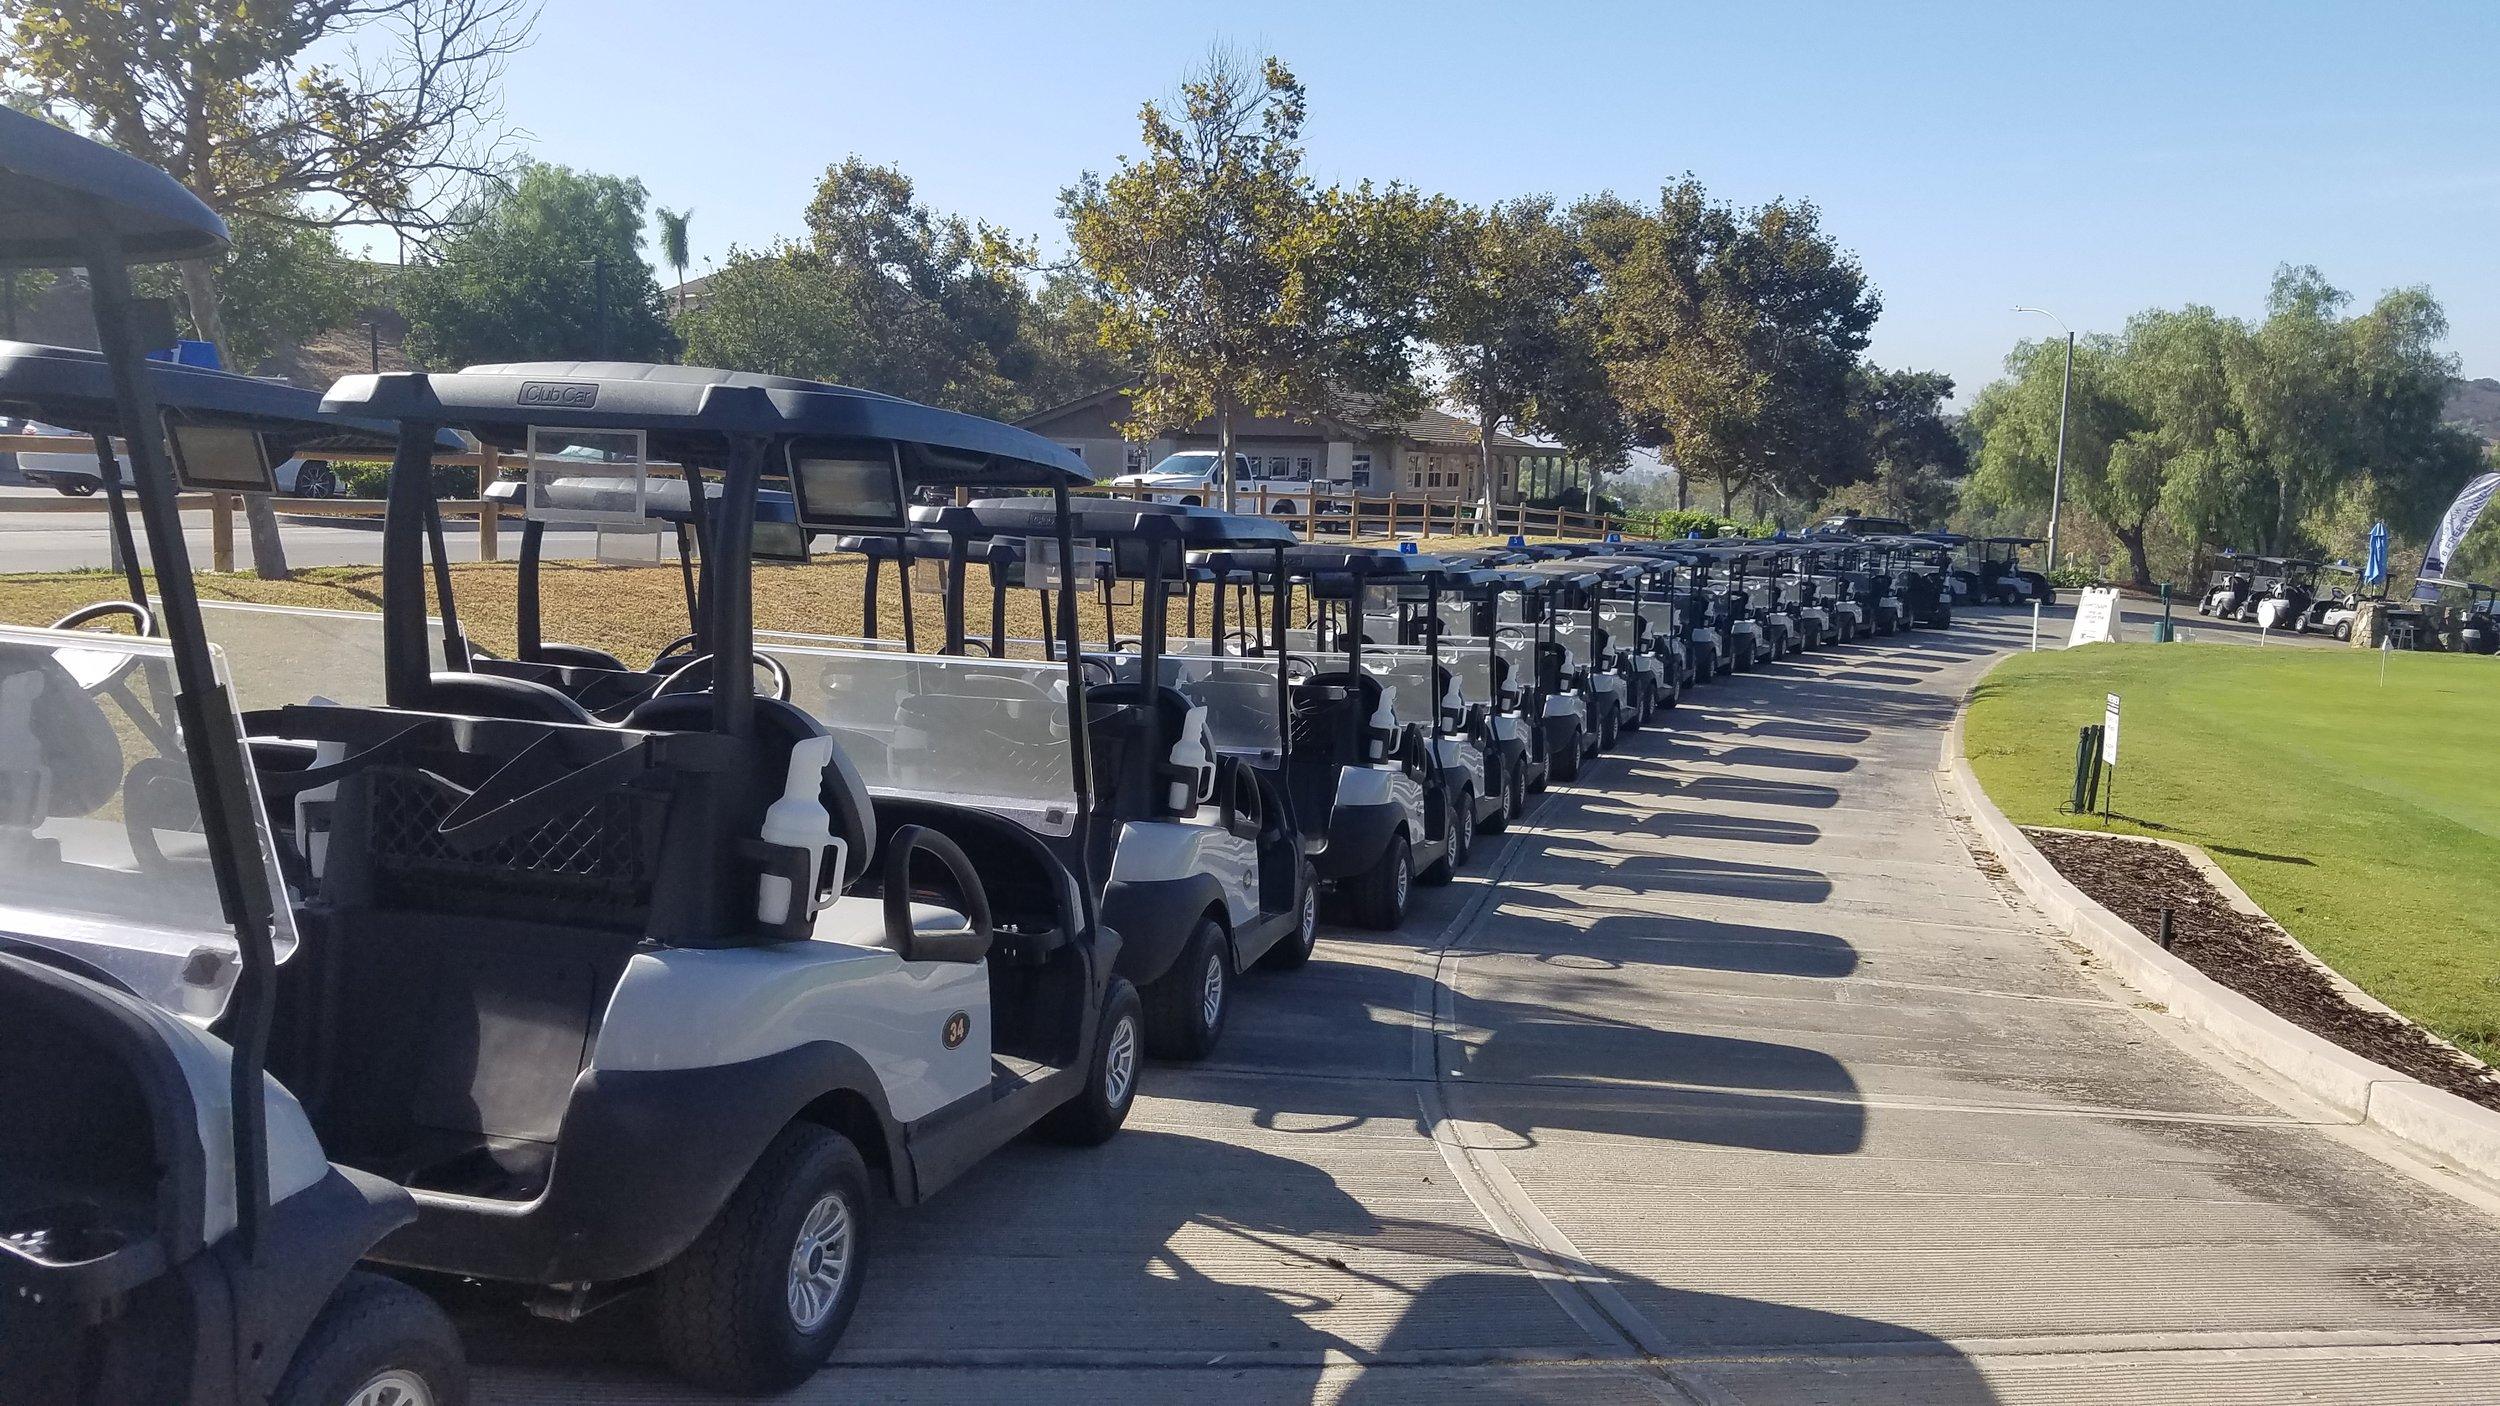 A line of golf carts.